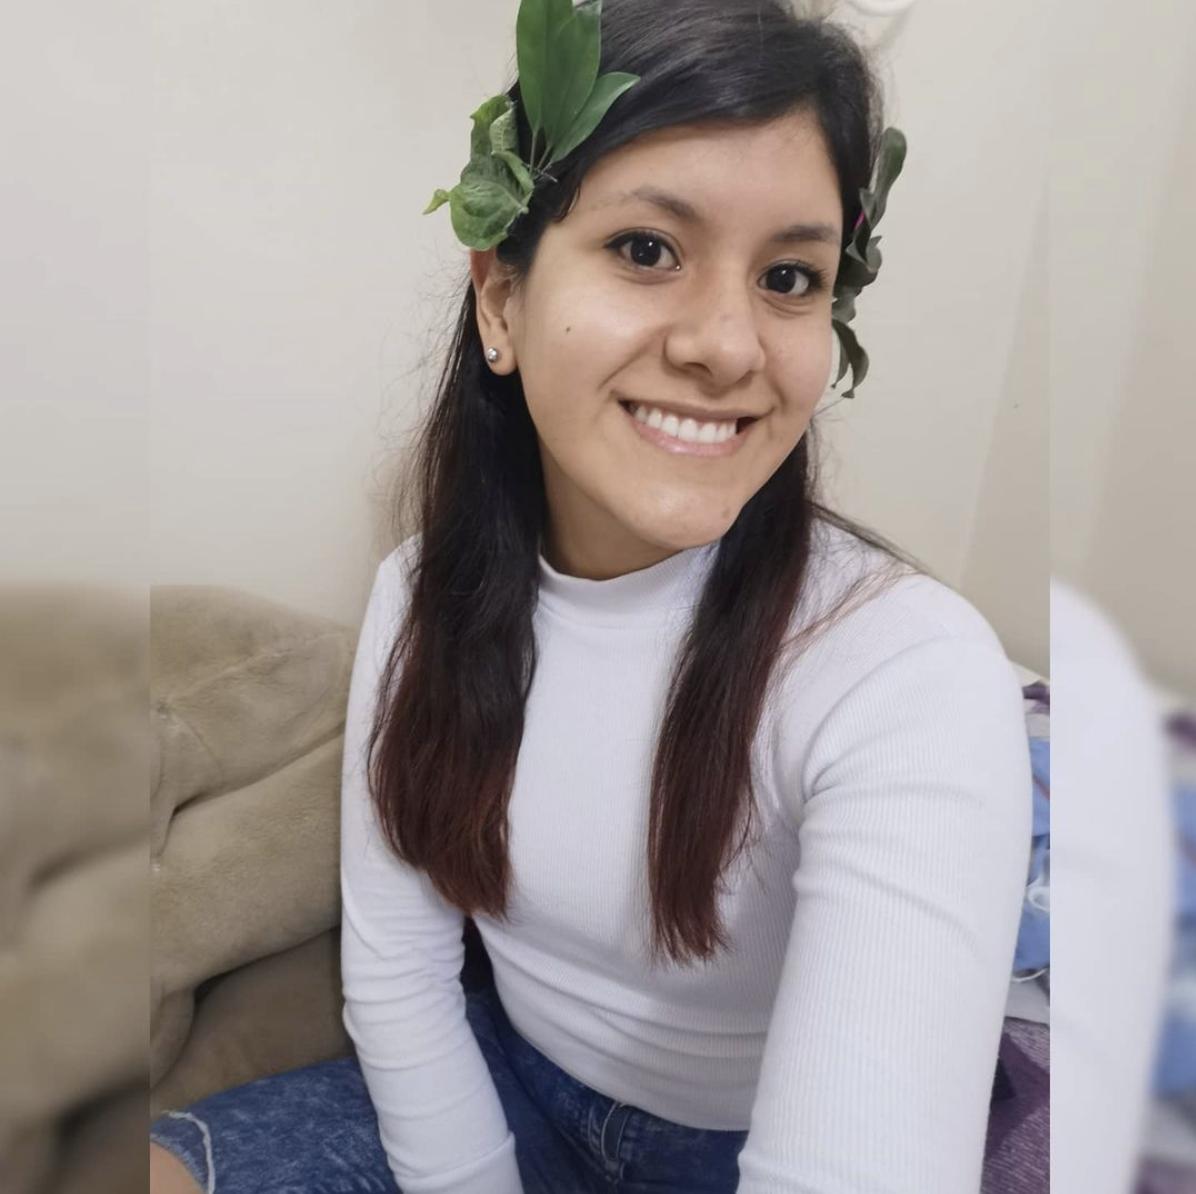 Flavia Alvarado Cancino